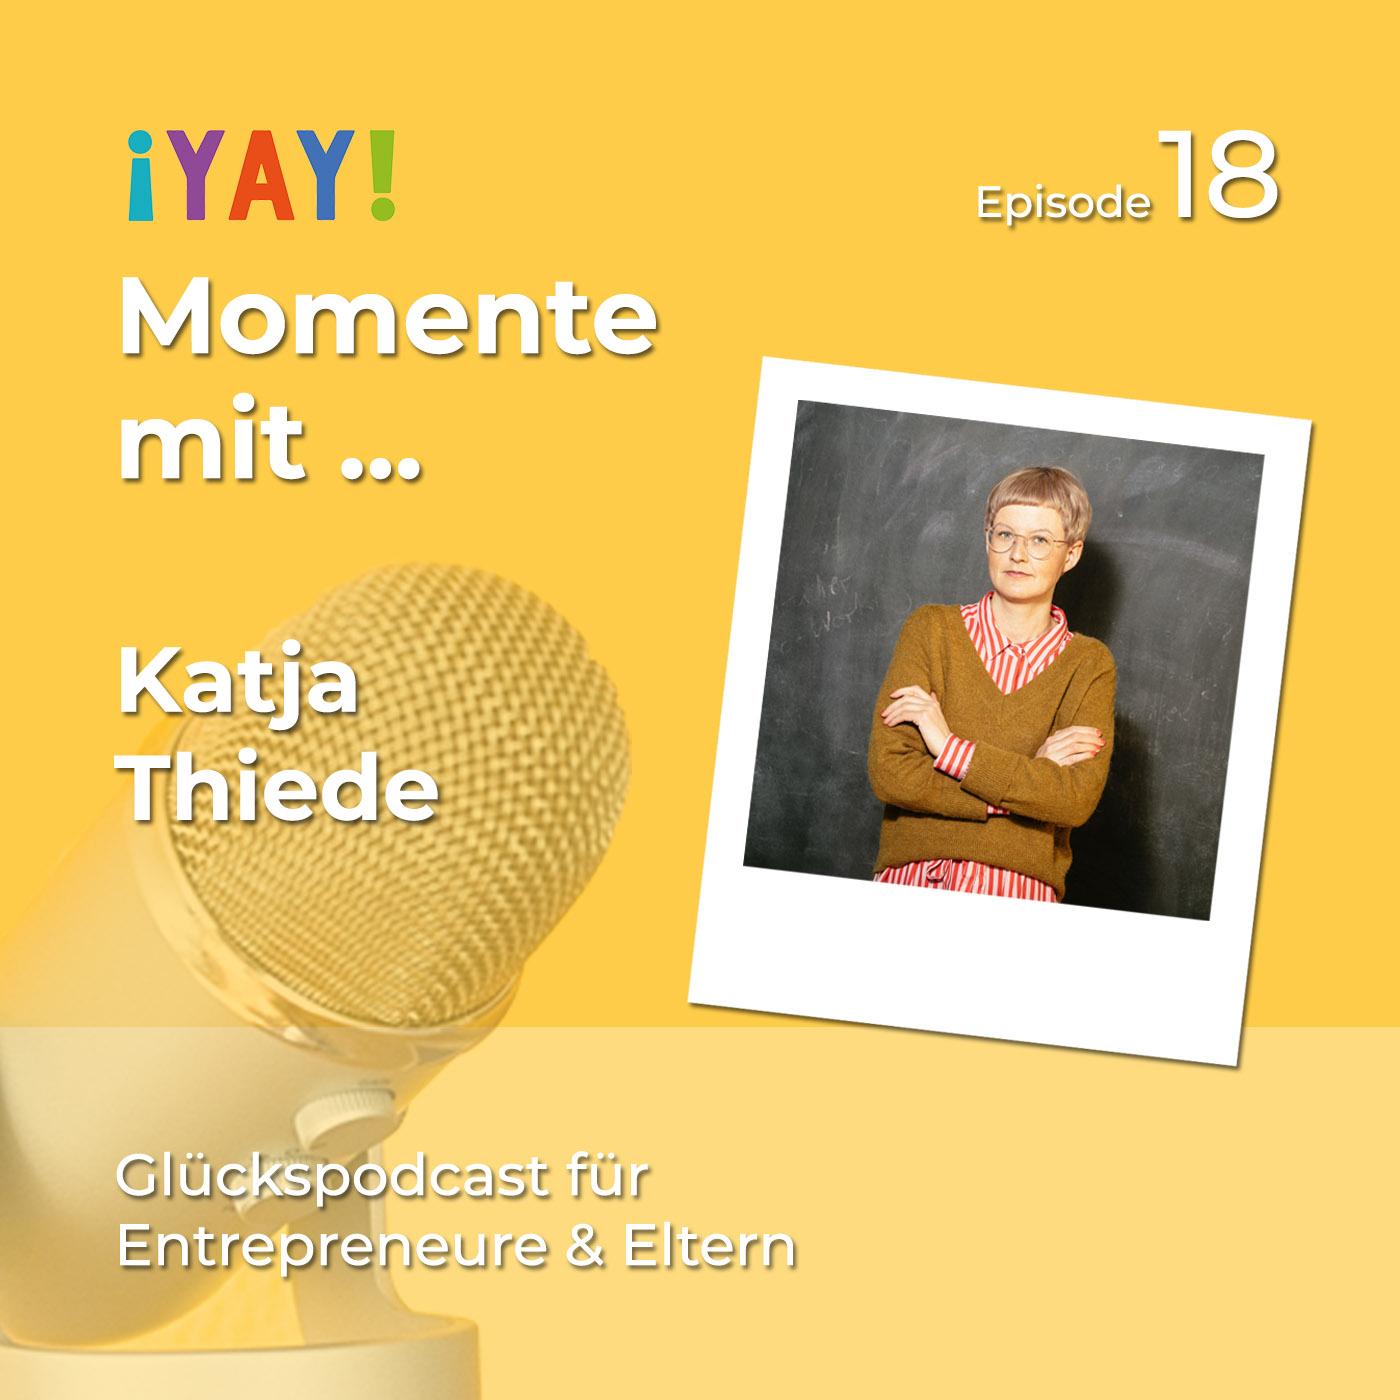 Yay-Momente mit CoWorking Space-Gründerin Katja Thiede